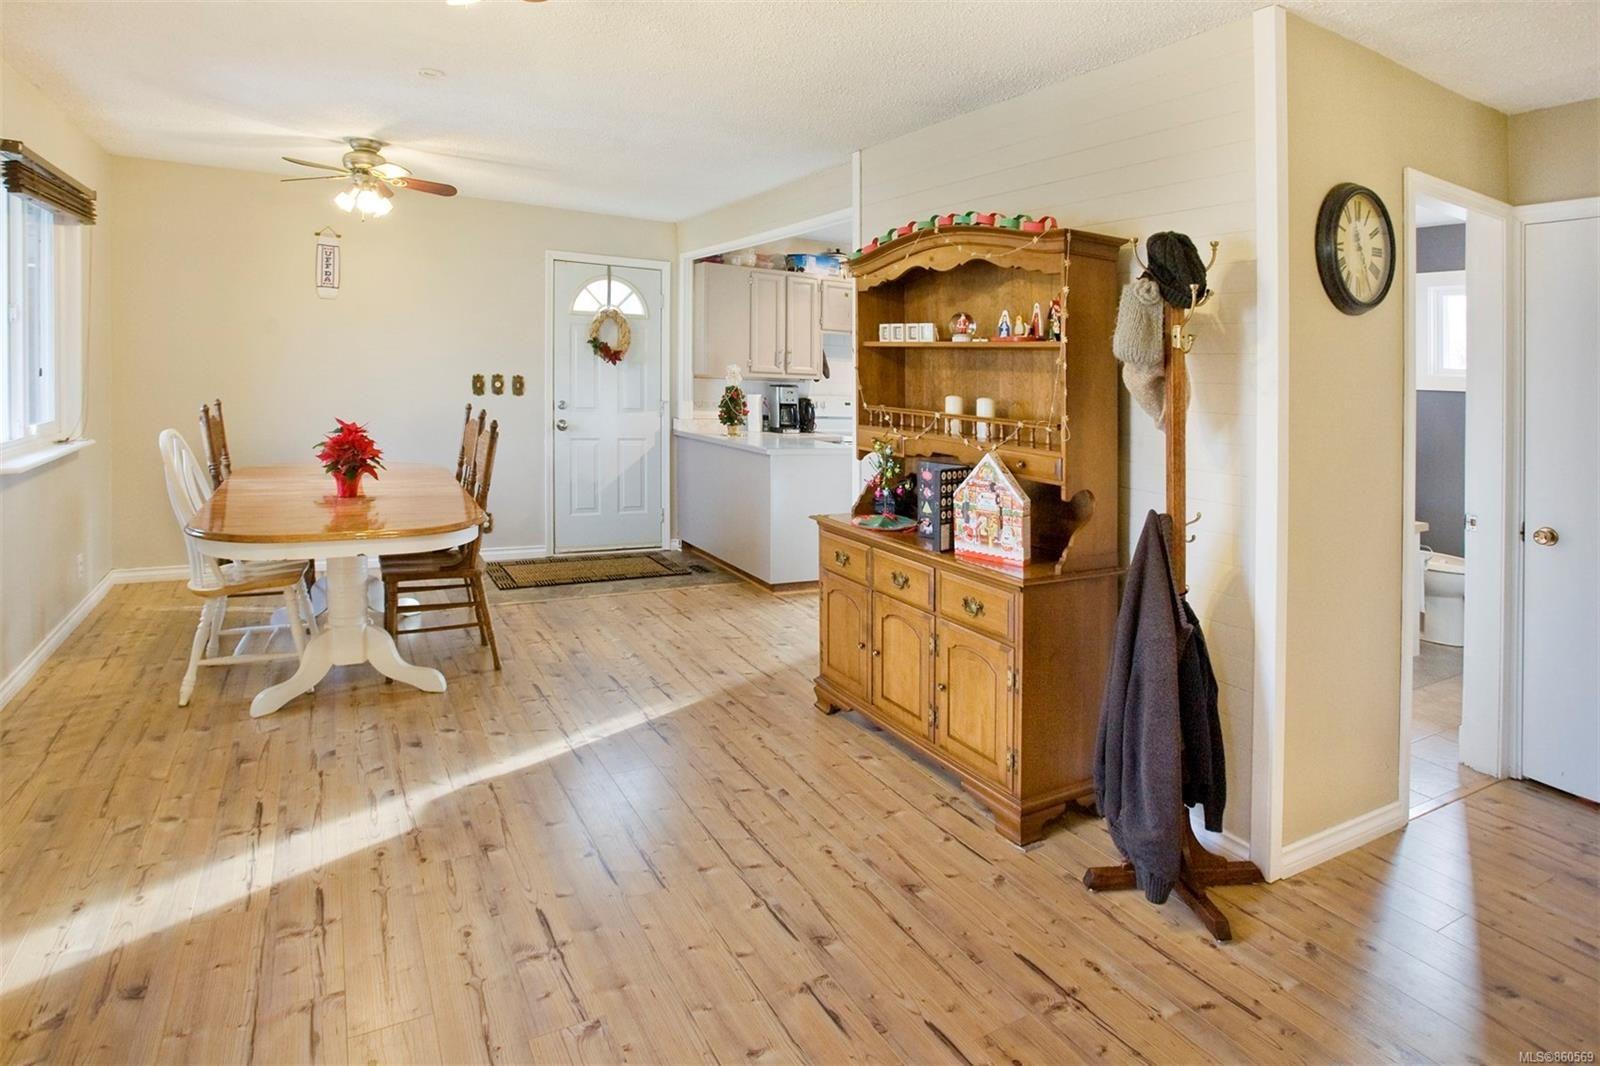 Photo 6: Photos: 4156 Ravenhill Ave in : PA Port Alberni House for sale (Port Alberni)  : MLS®# 860569